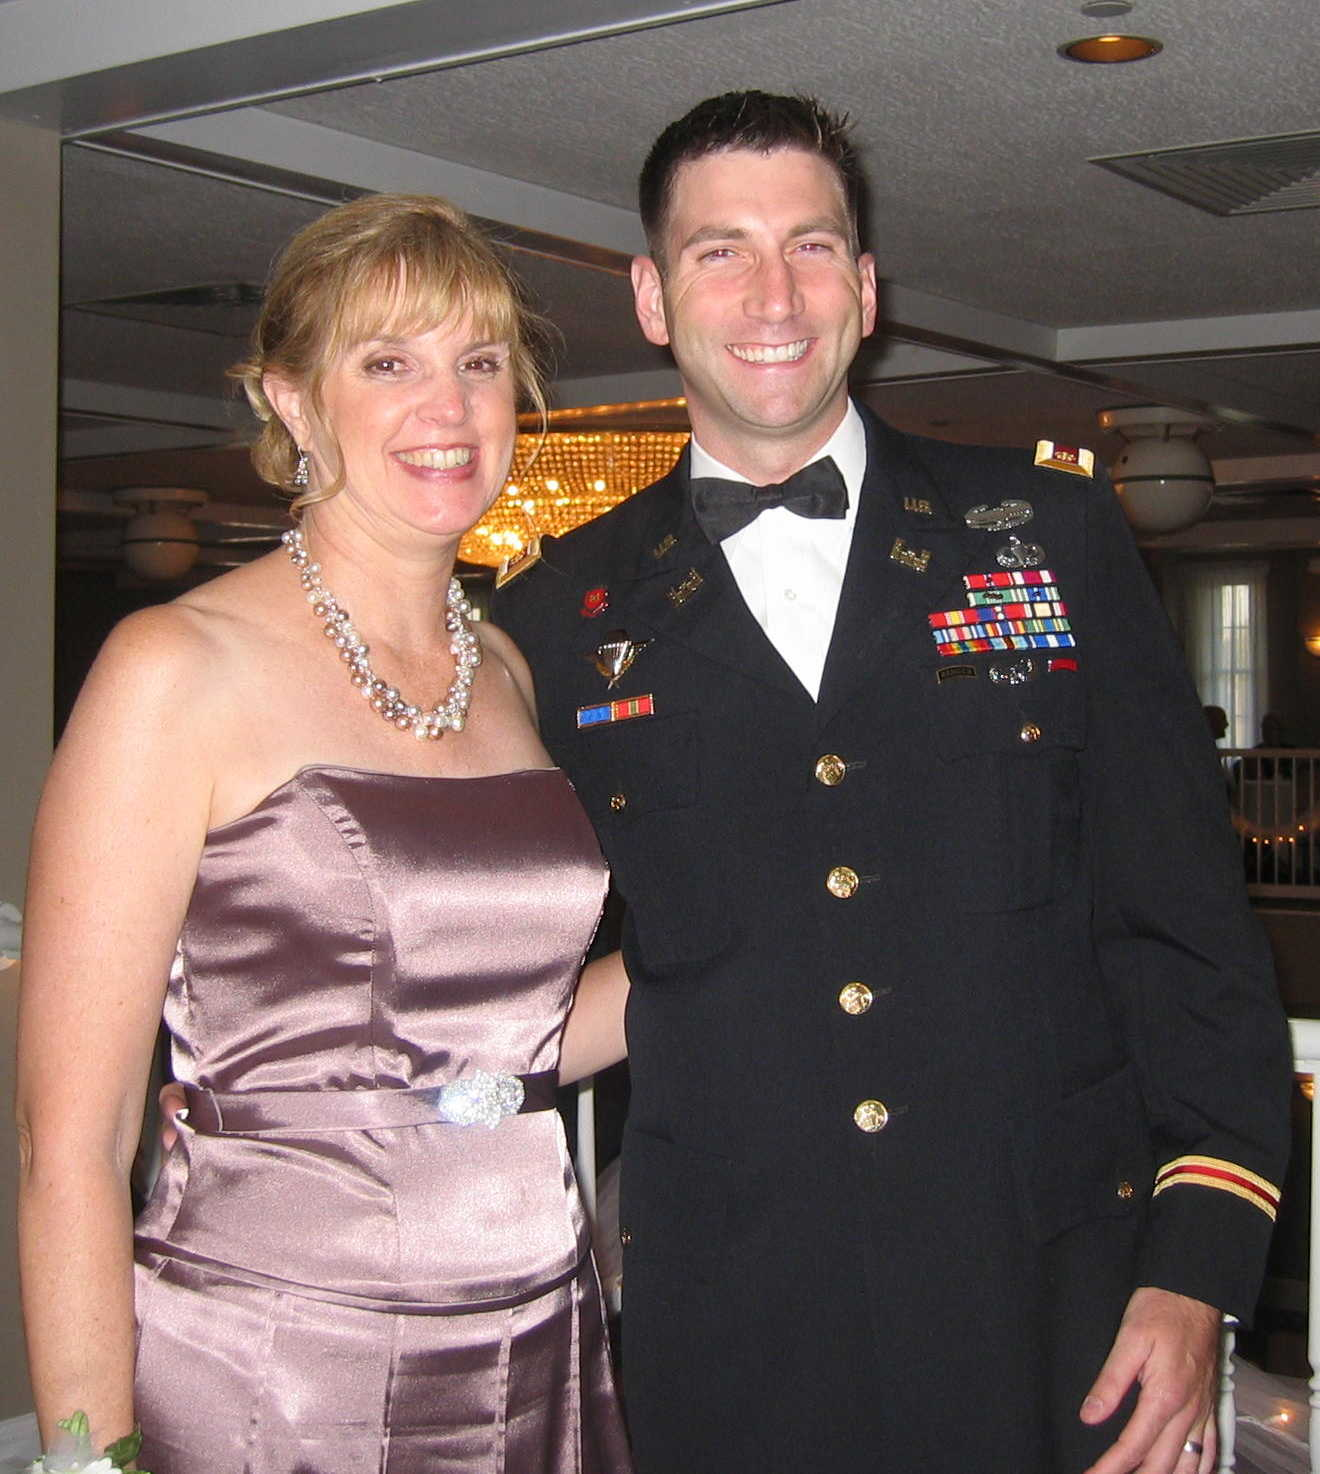 Marybeth and the Major